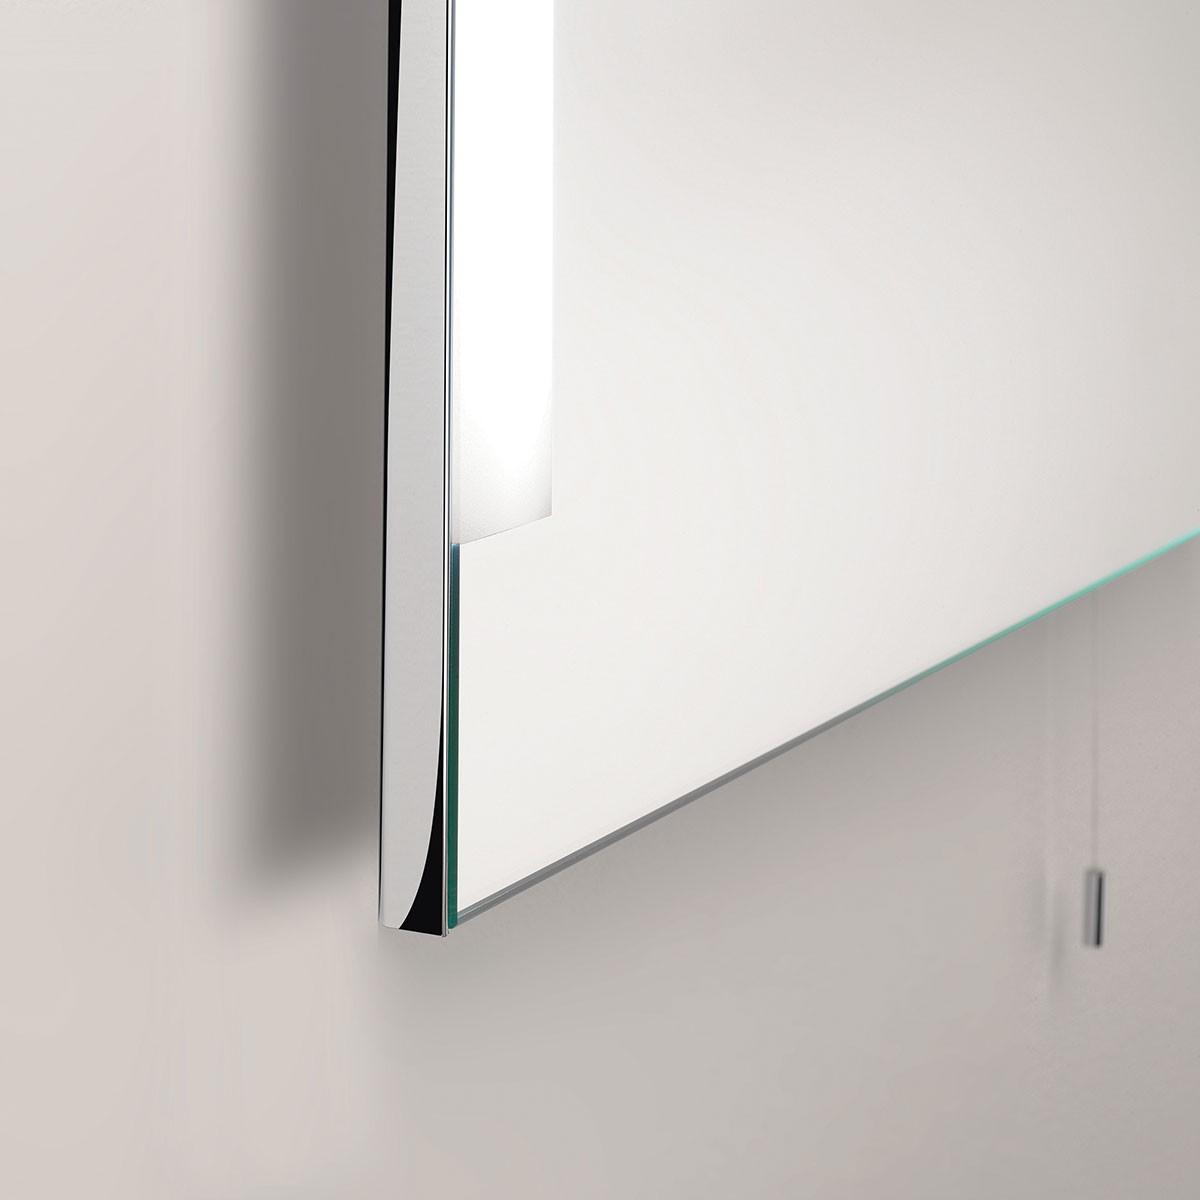 Astro Imola 800 Polished Chrome Bathroom Mirror Light at